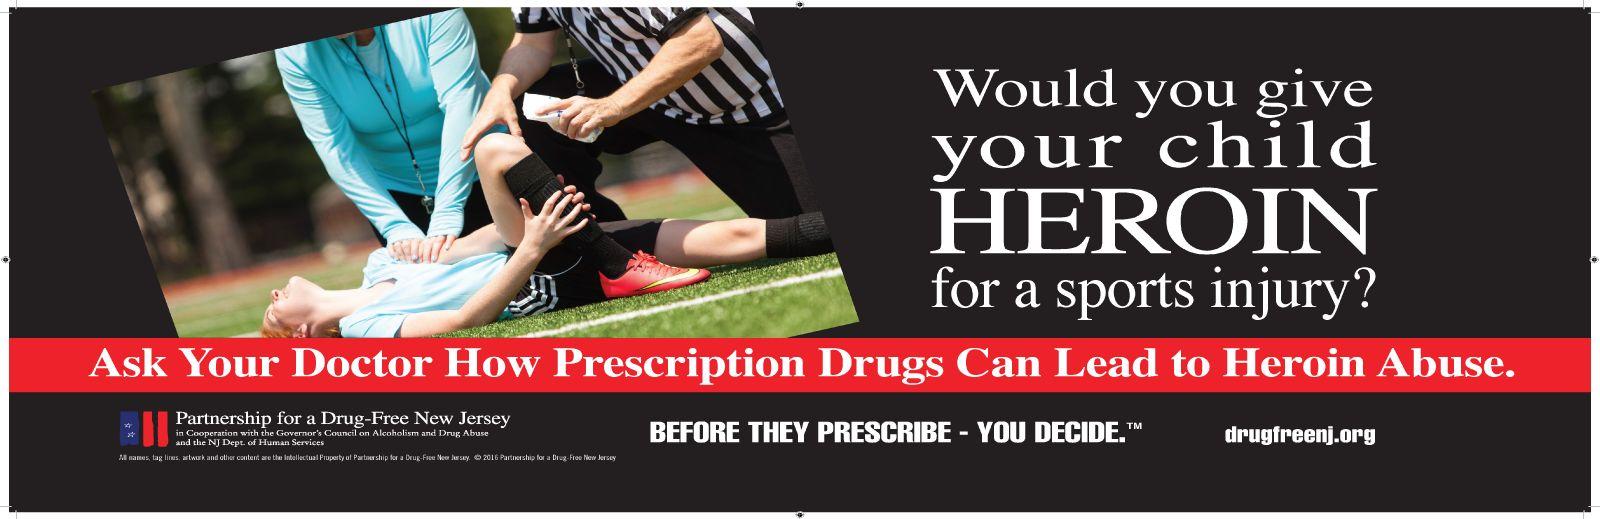 Drug Free NJ - Blog - Media Campaign to Combat Opiate Abuse